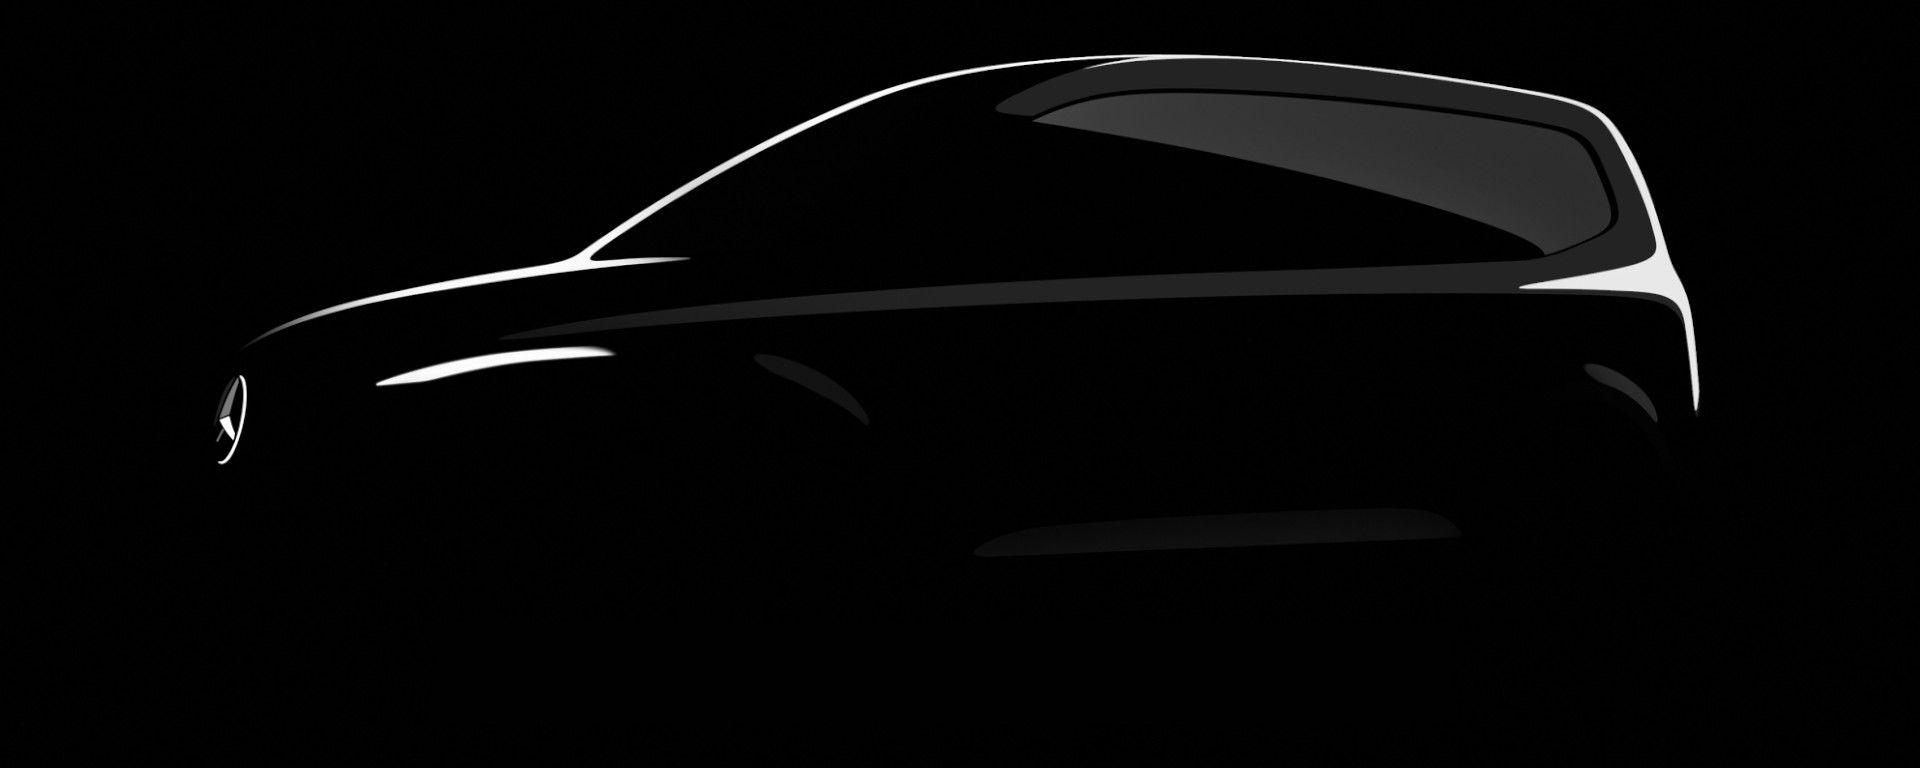 Mercedes Classe T: la prima immagine teaser